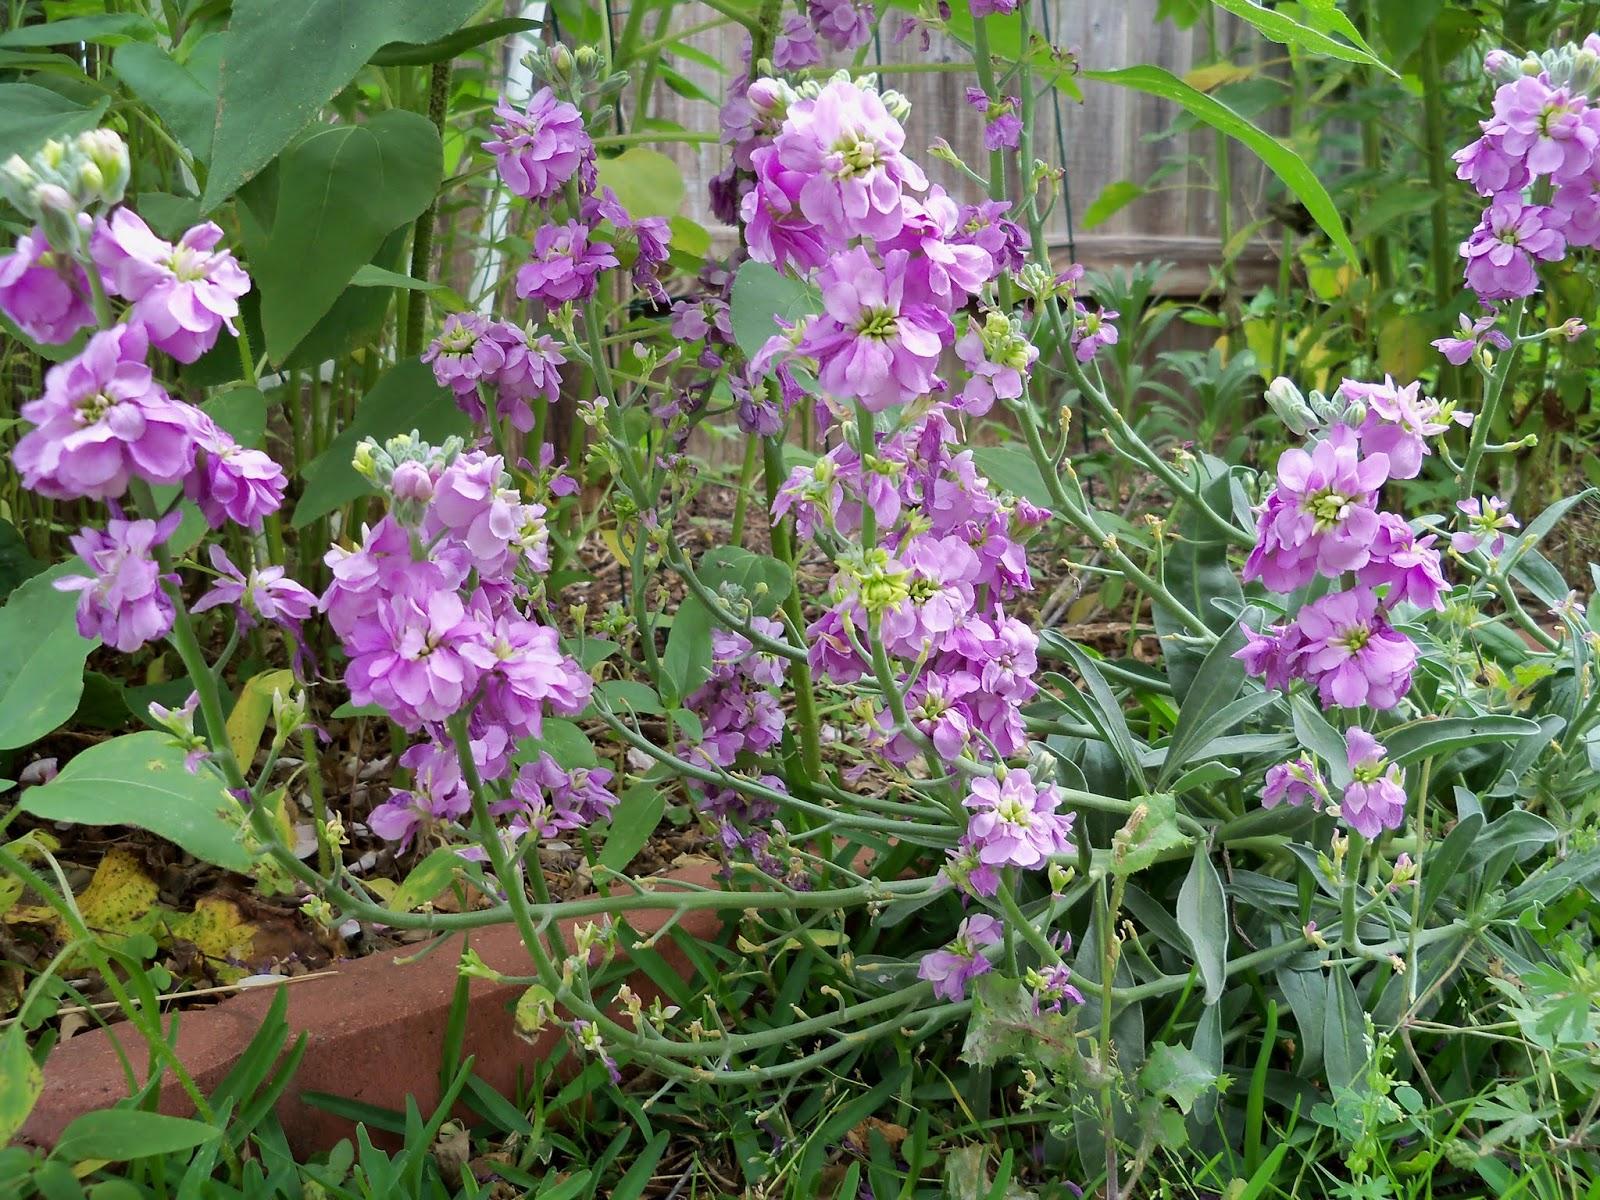 Gardening 2013 - 115_6031.JPG